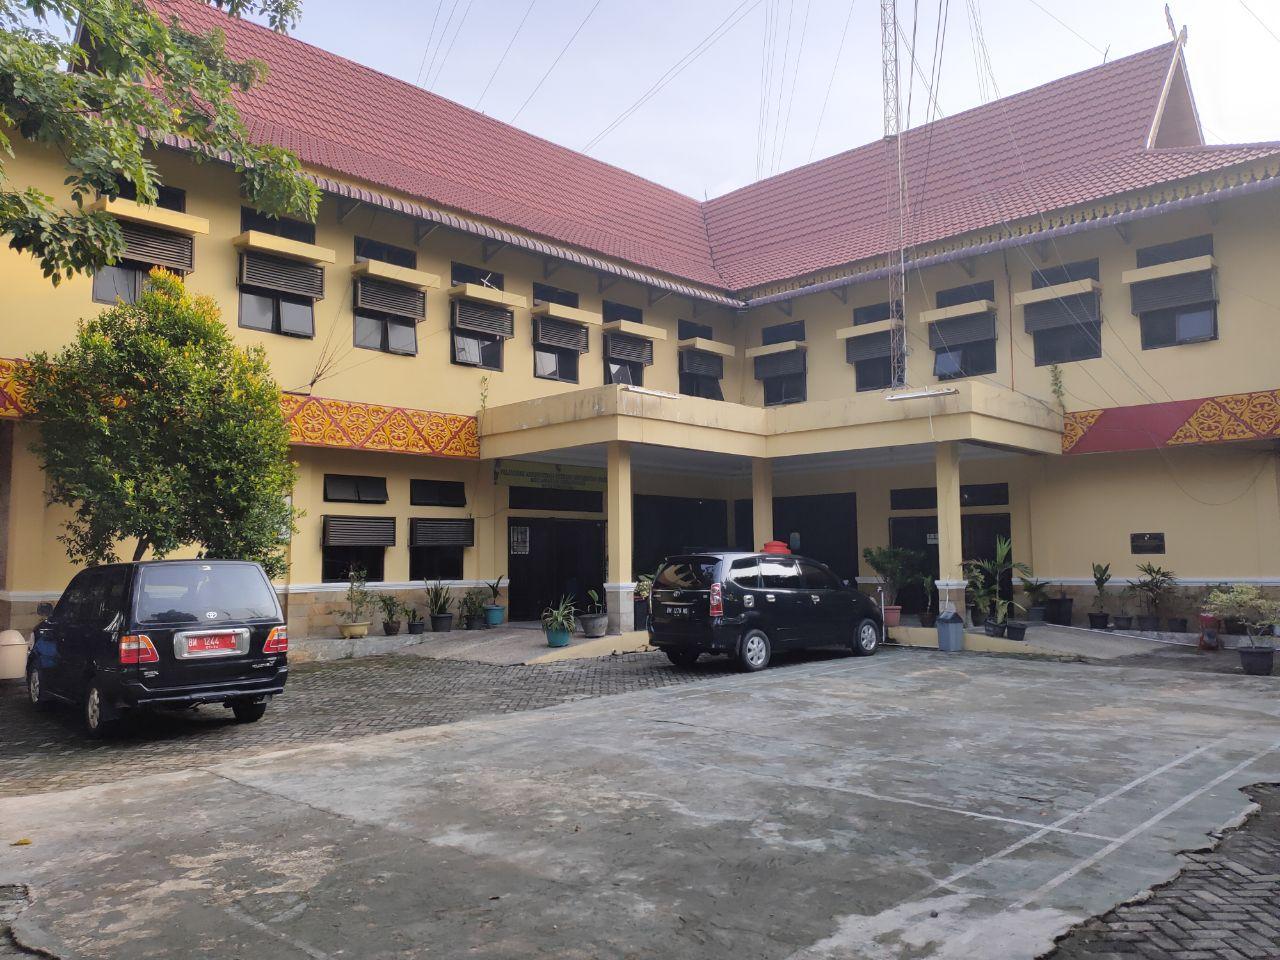 Image : Kecamatan Lima Puluh